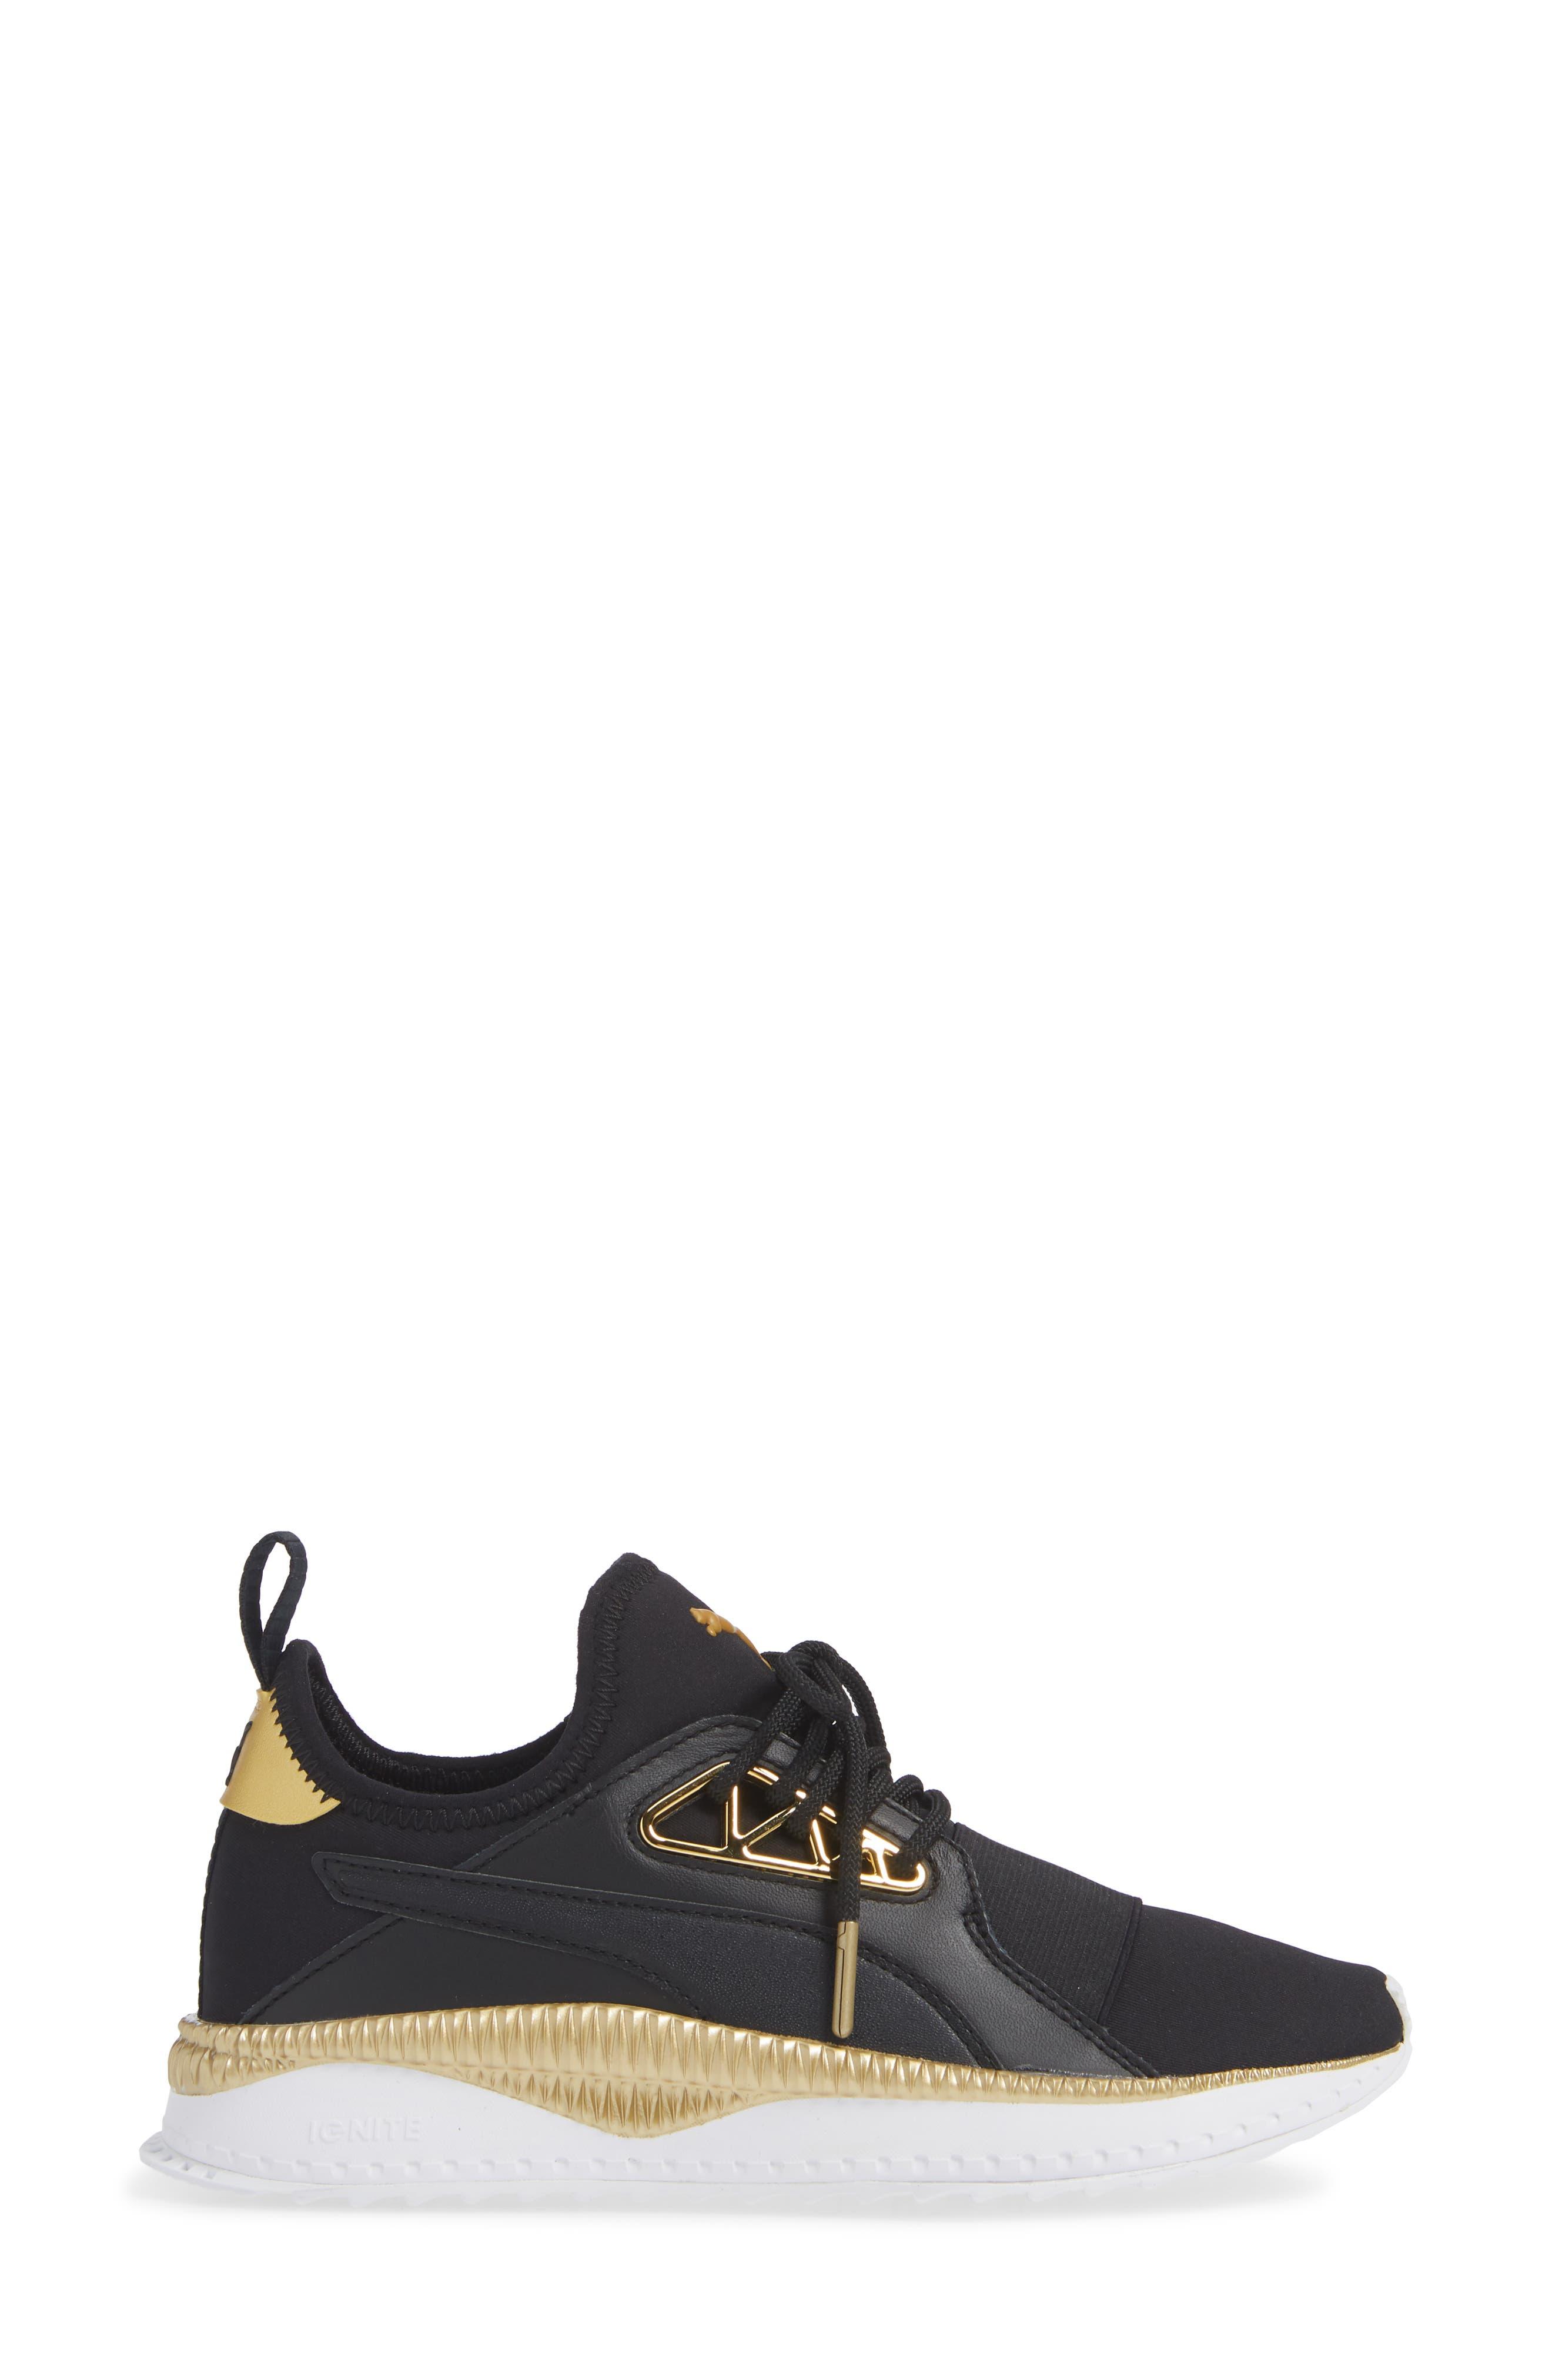 TSUGI Apex Jewel Sneaker,                             Alternate thumbnail 3, color,                             PUMA BLACK/ PUMA BLACK